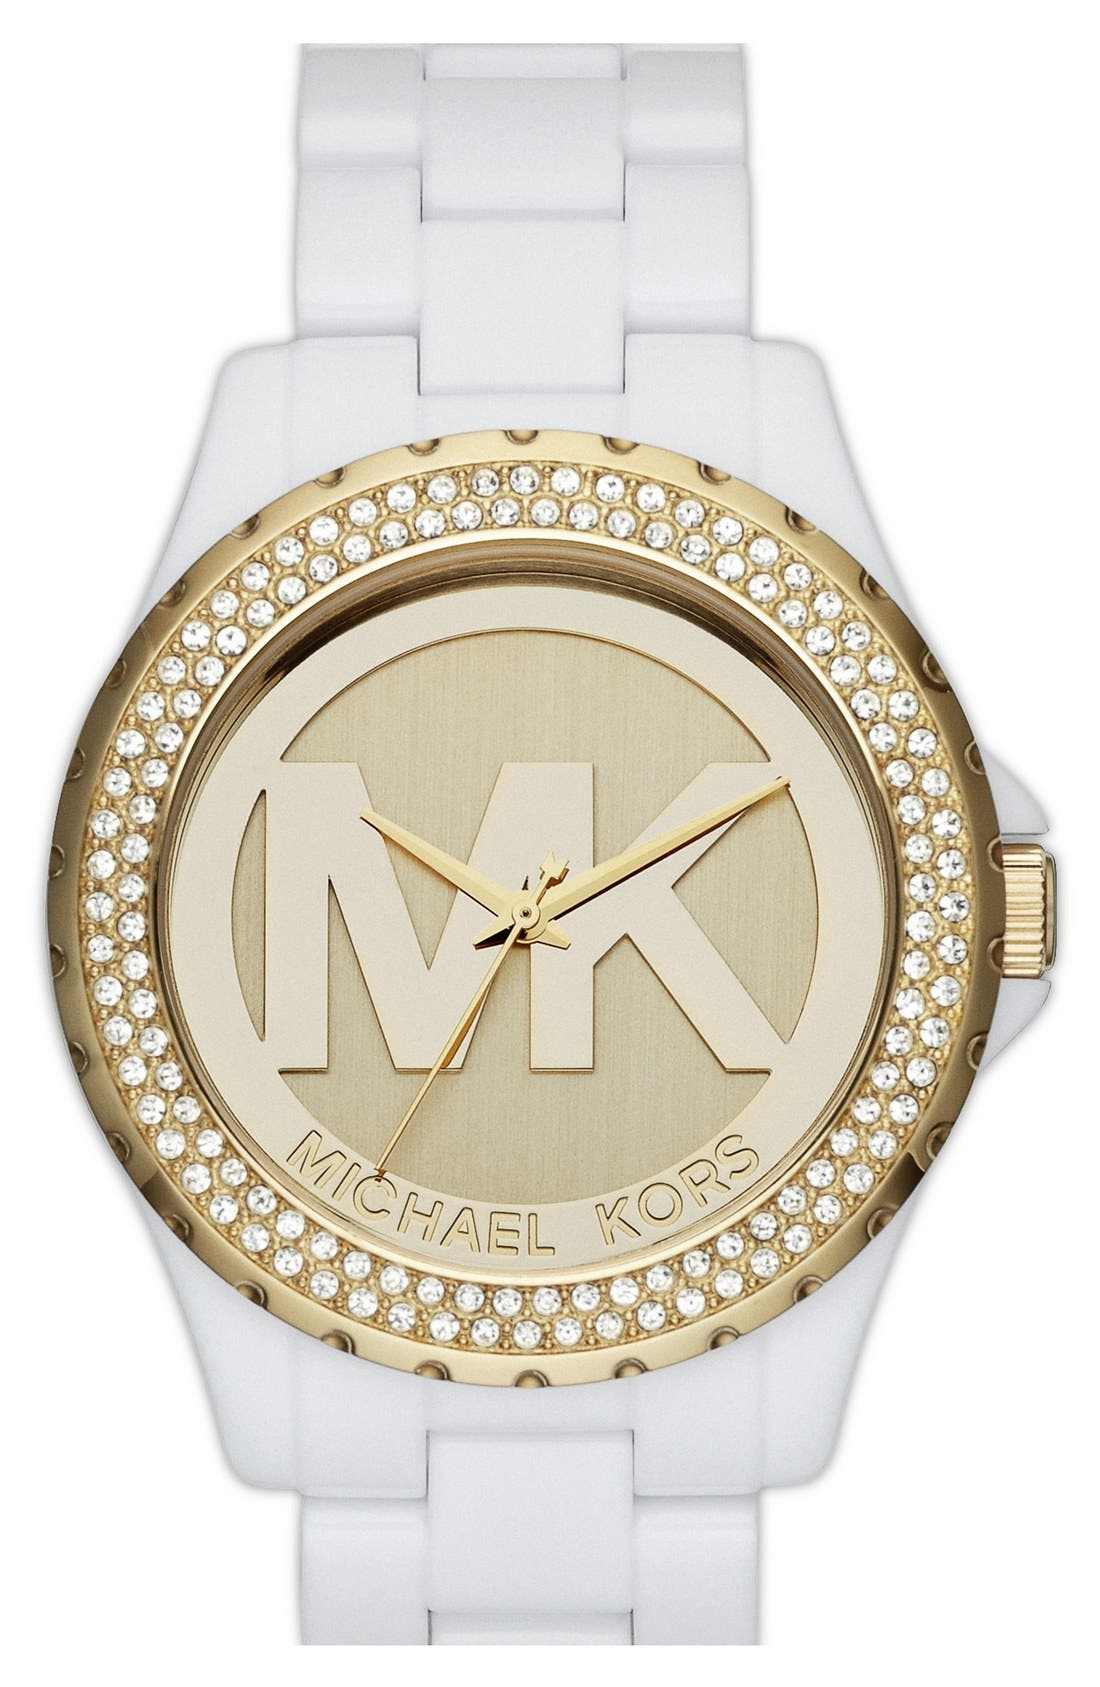 Main Image - Michael Kors 'Madison' Crystal Bezel Logo Watch, 42mm